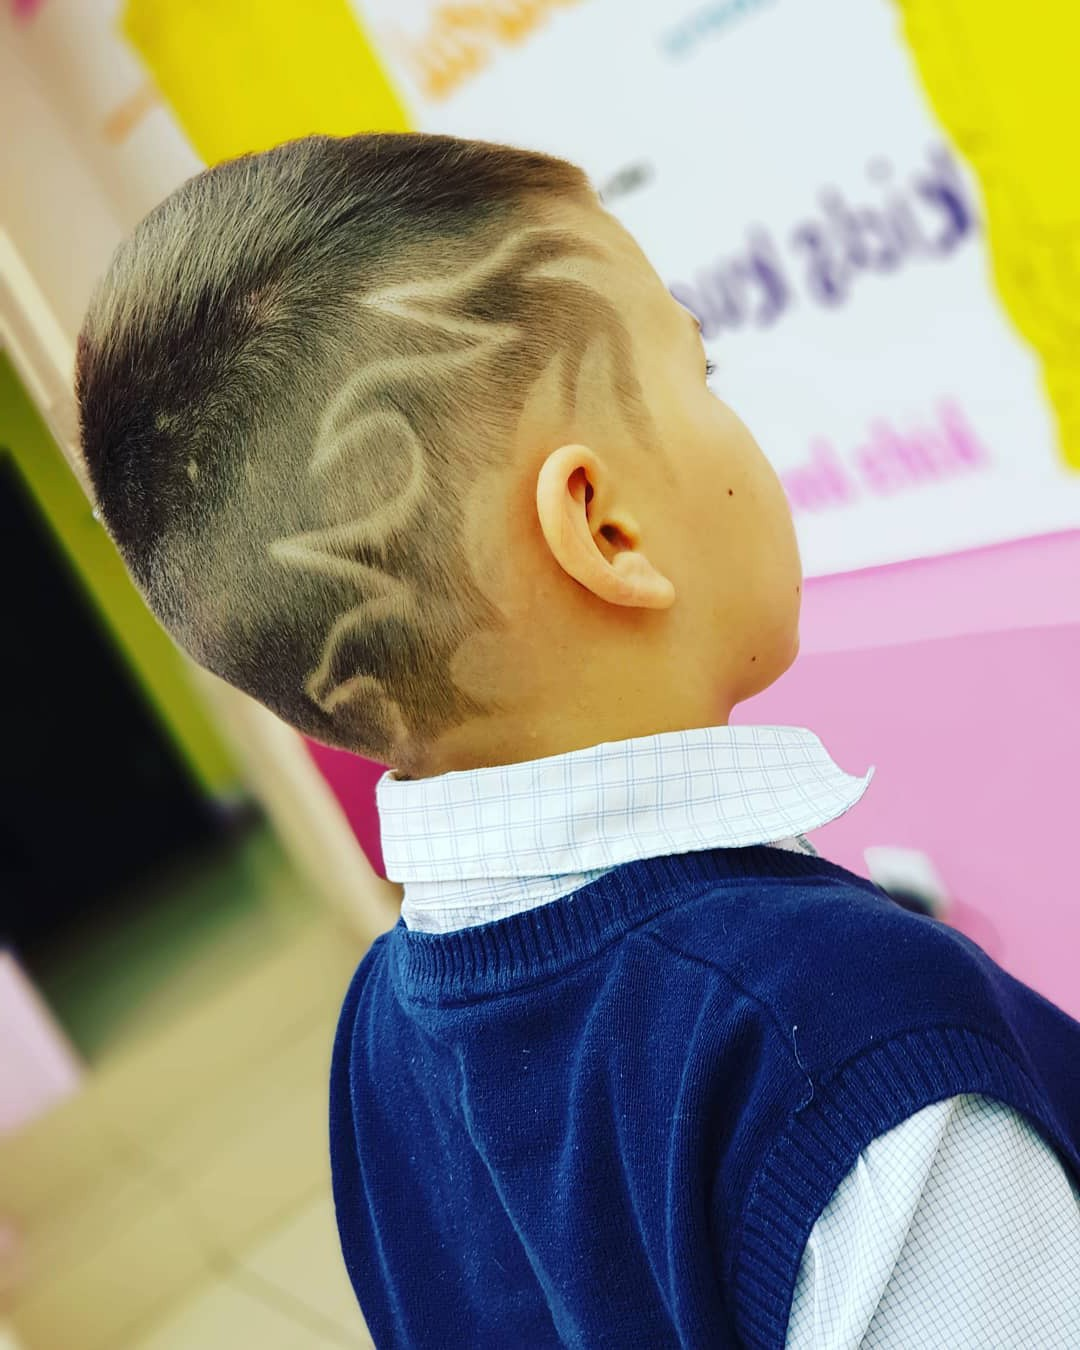 Flaming Hair Design for Kids